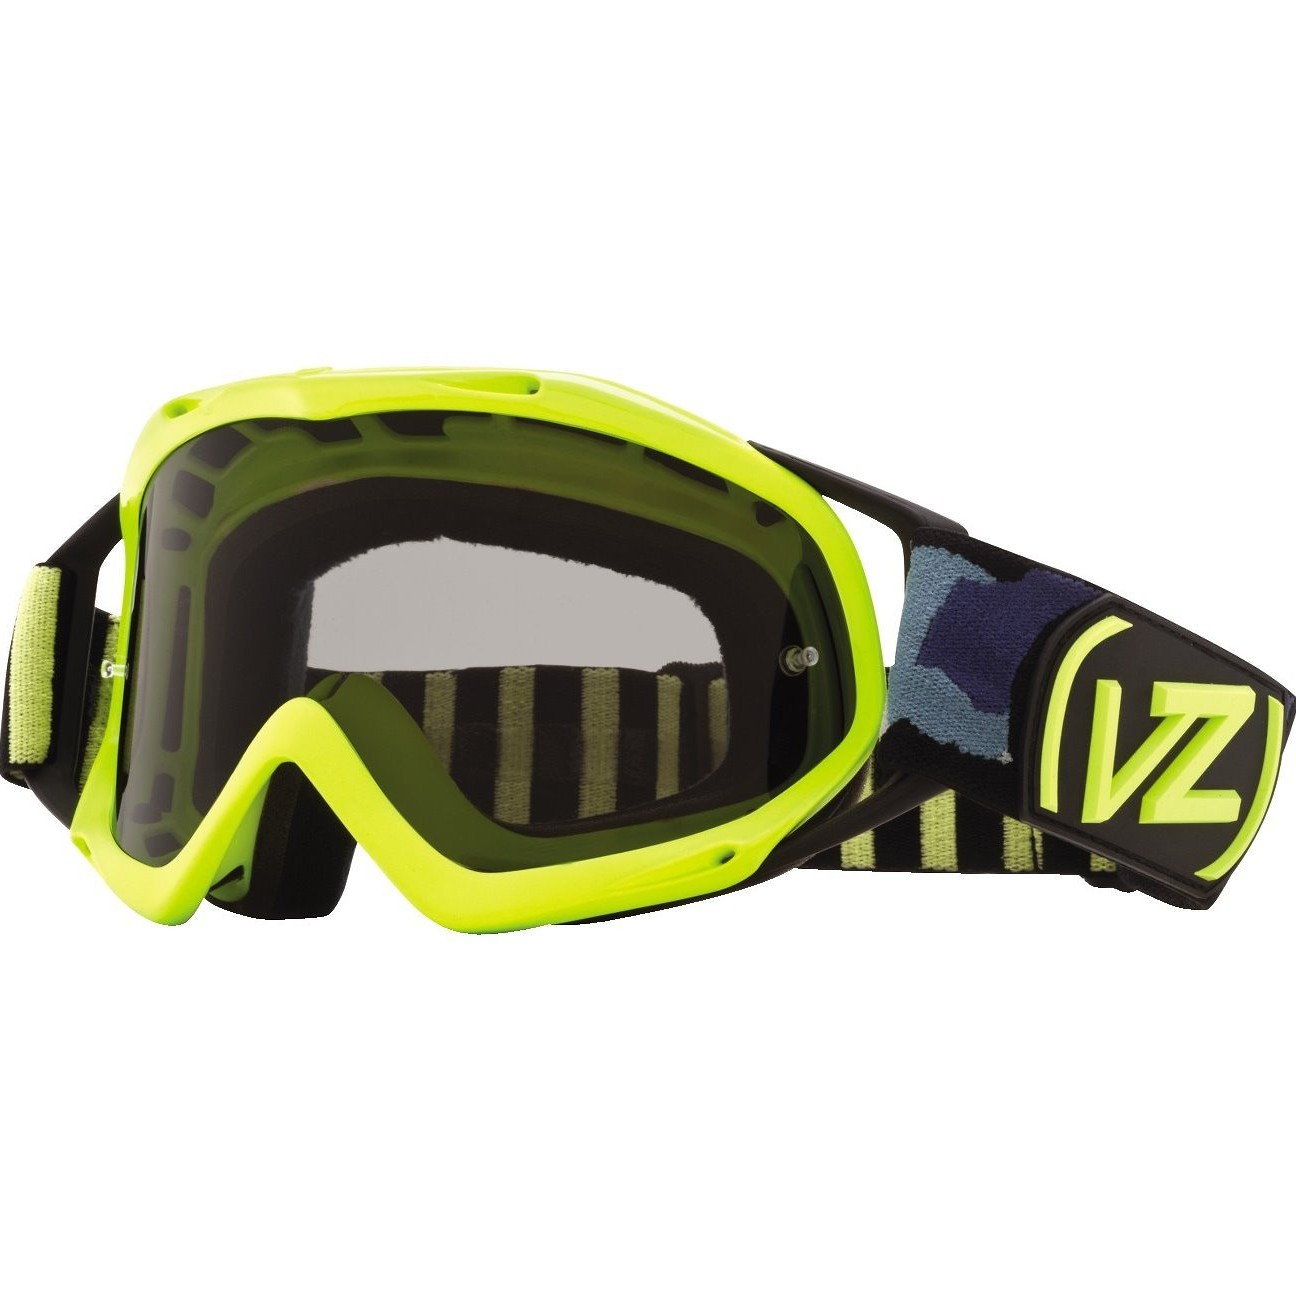 Von Zipper Bushwick XT Calicamo Goggles  Von Zipper Bushwick XT Calicamo